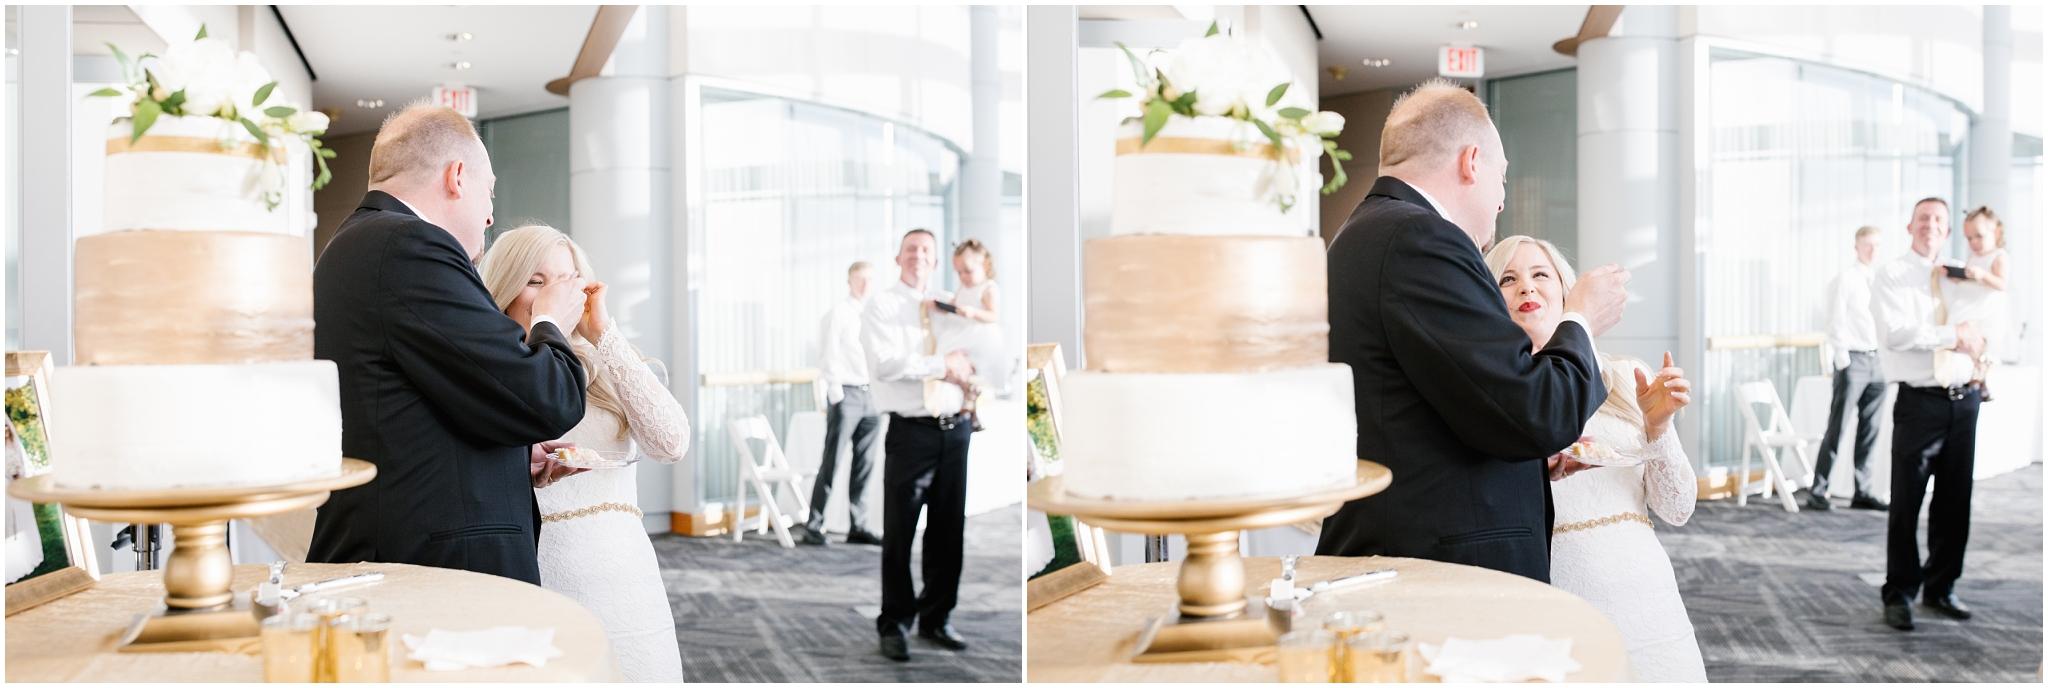 CherylandTyler-523_Lizzie-B-Imagery-Utah-Wedding-Photographer-Salt-Lake-City-Temple-Wells-Fargo-Building-Reception.jpg